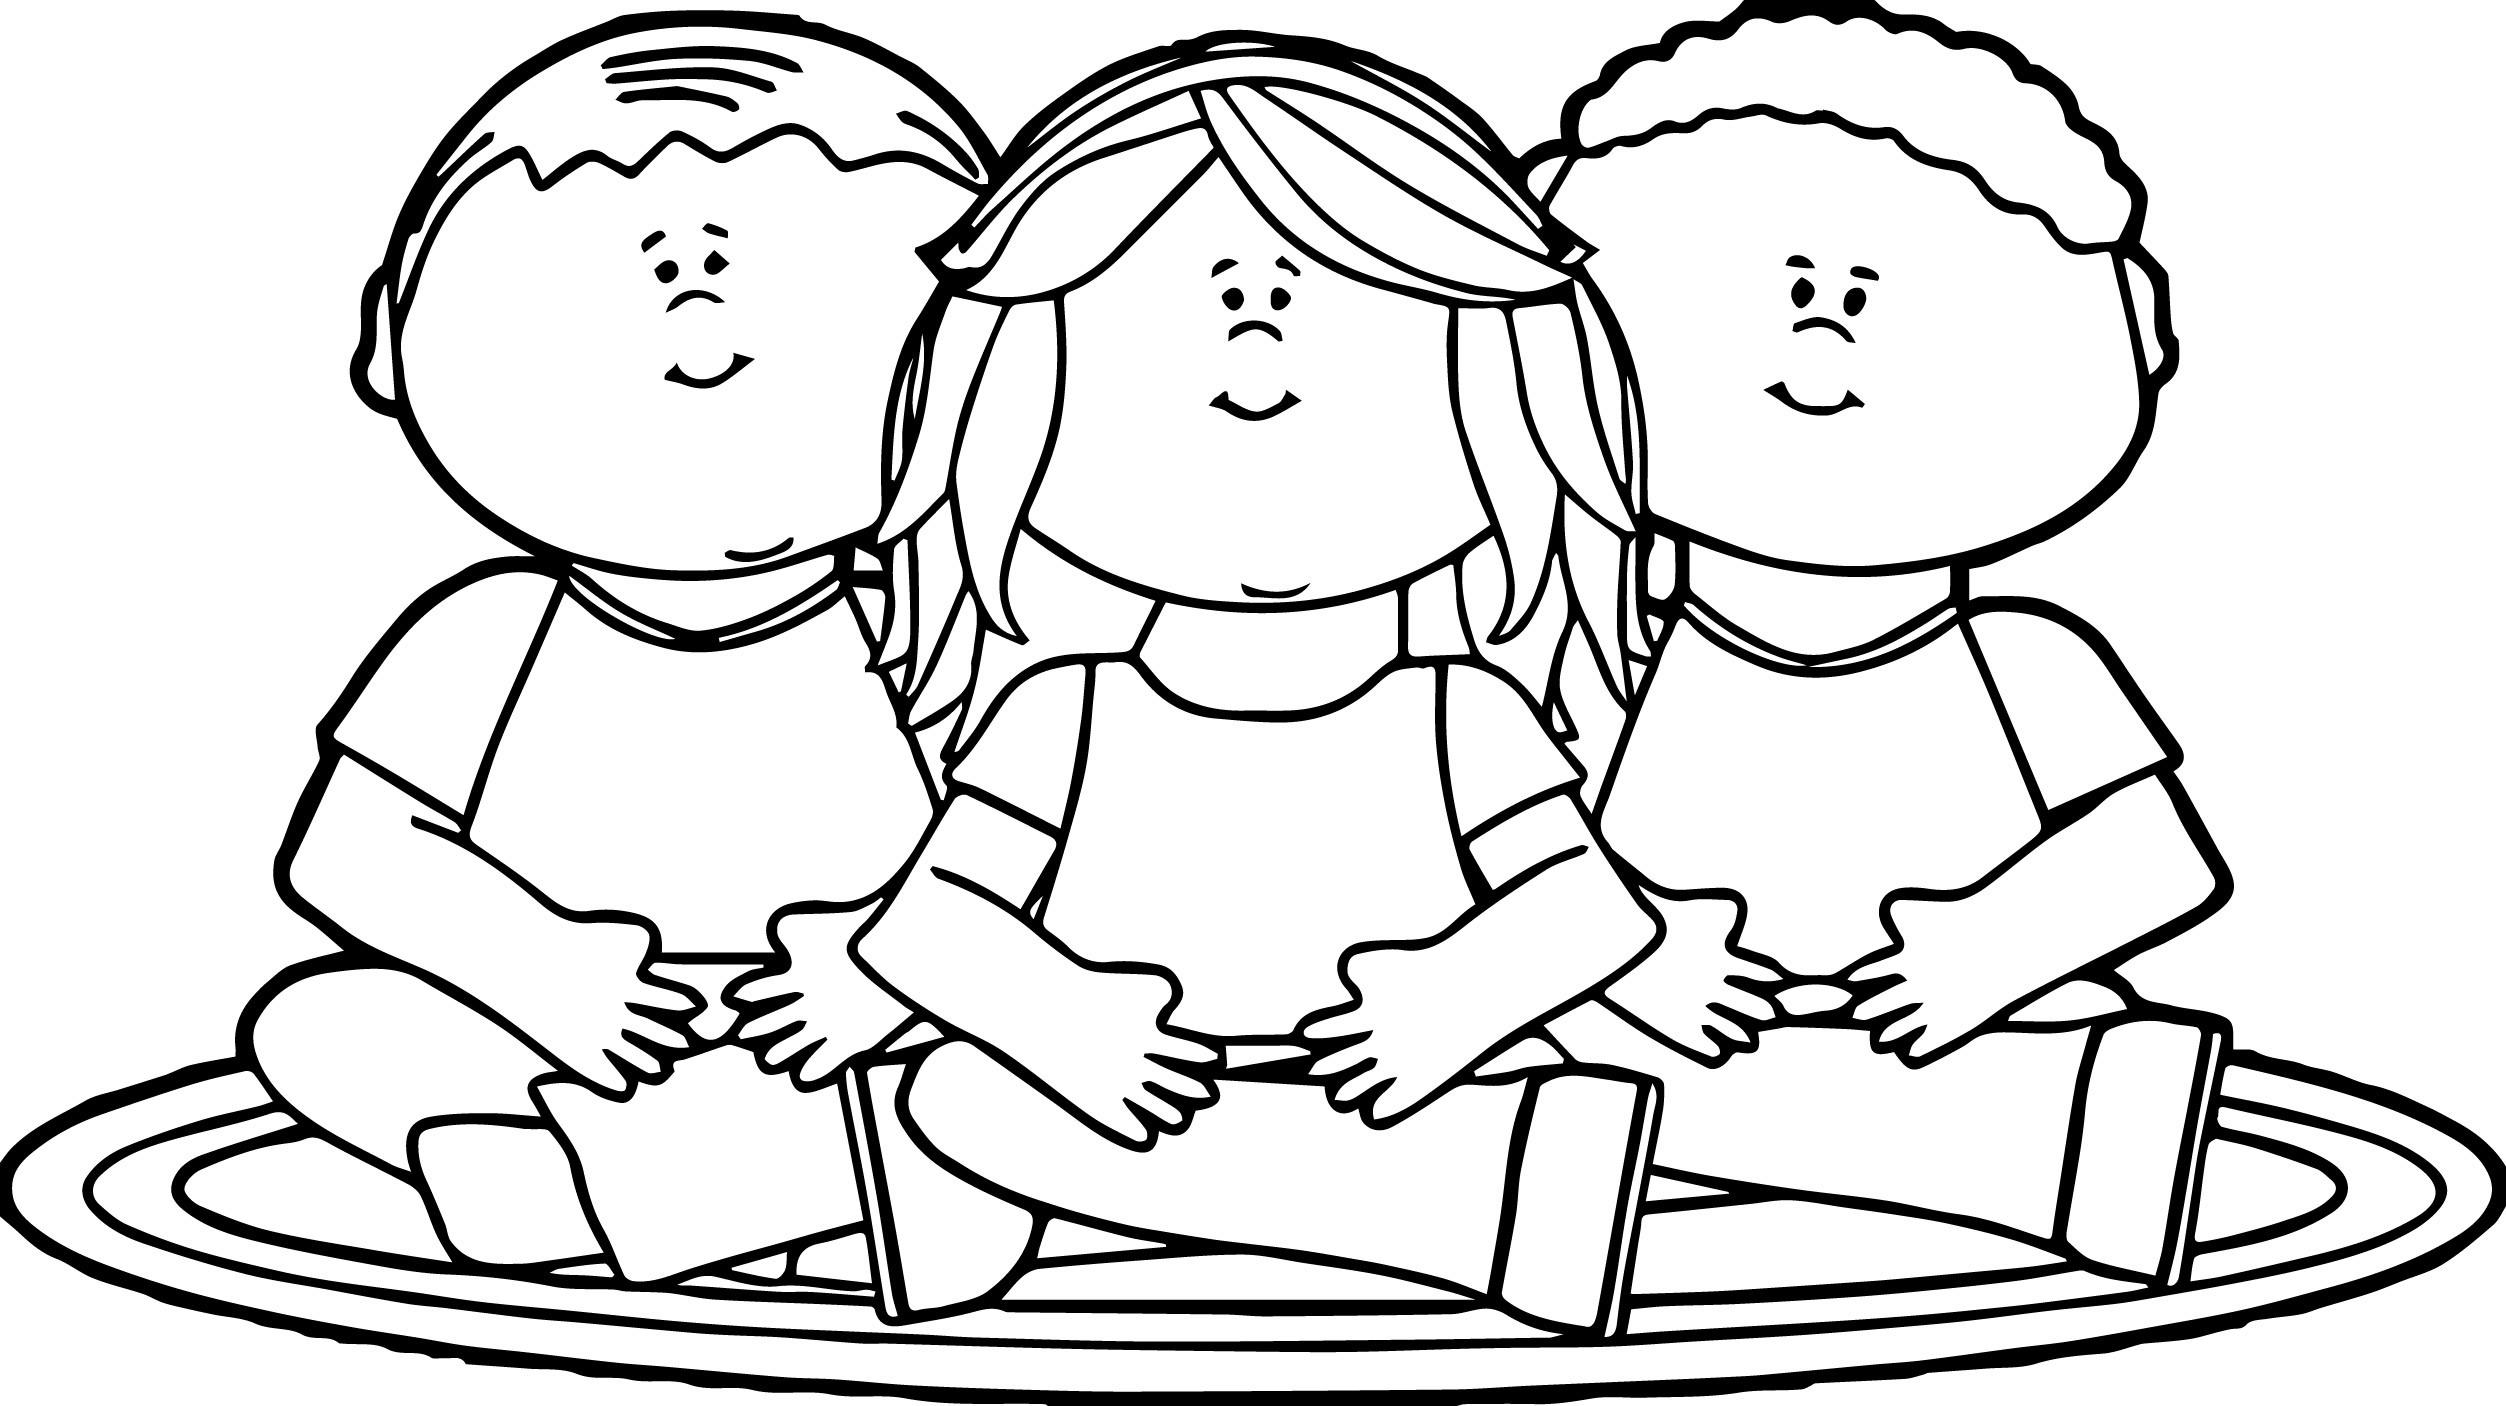 Coloring Sheets For Kids School Time  Desenho de Tapete na sala de aula para colorir Tudodesenhos